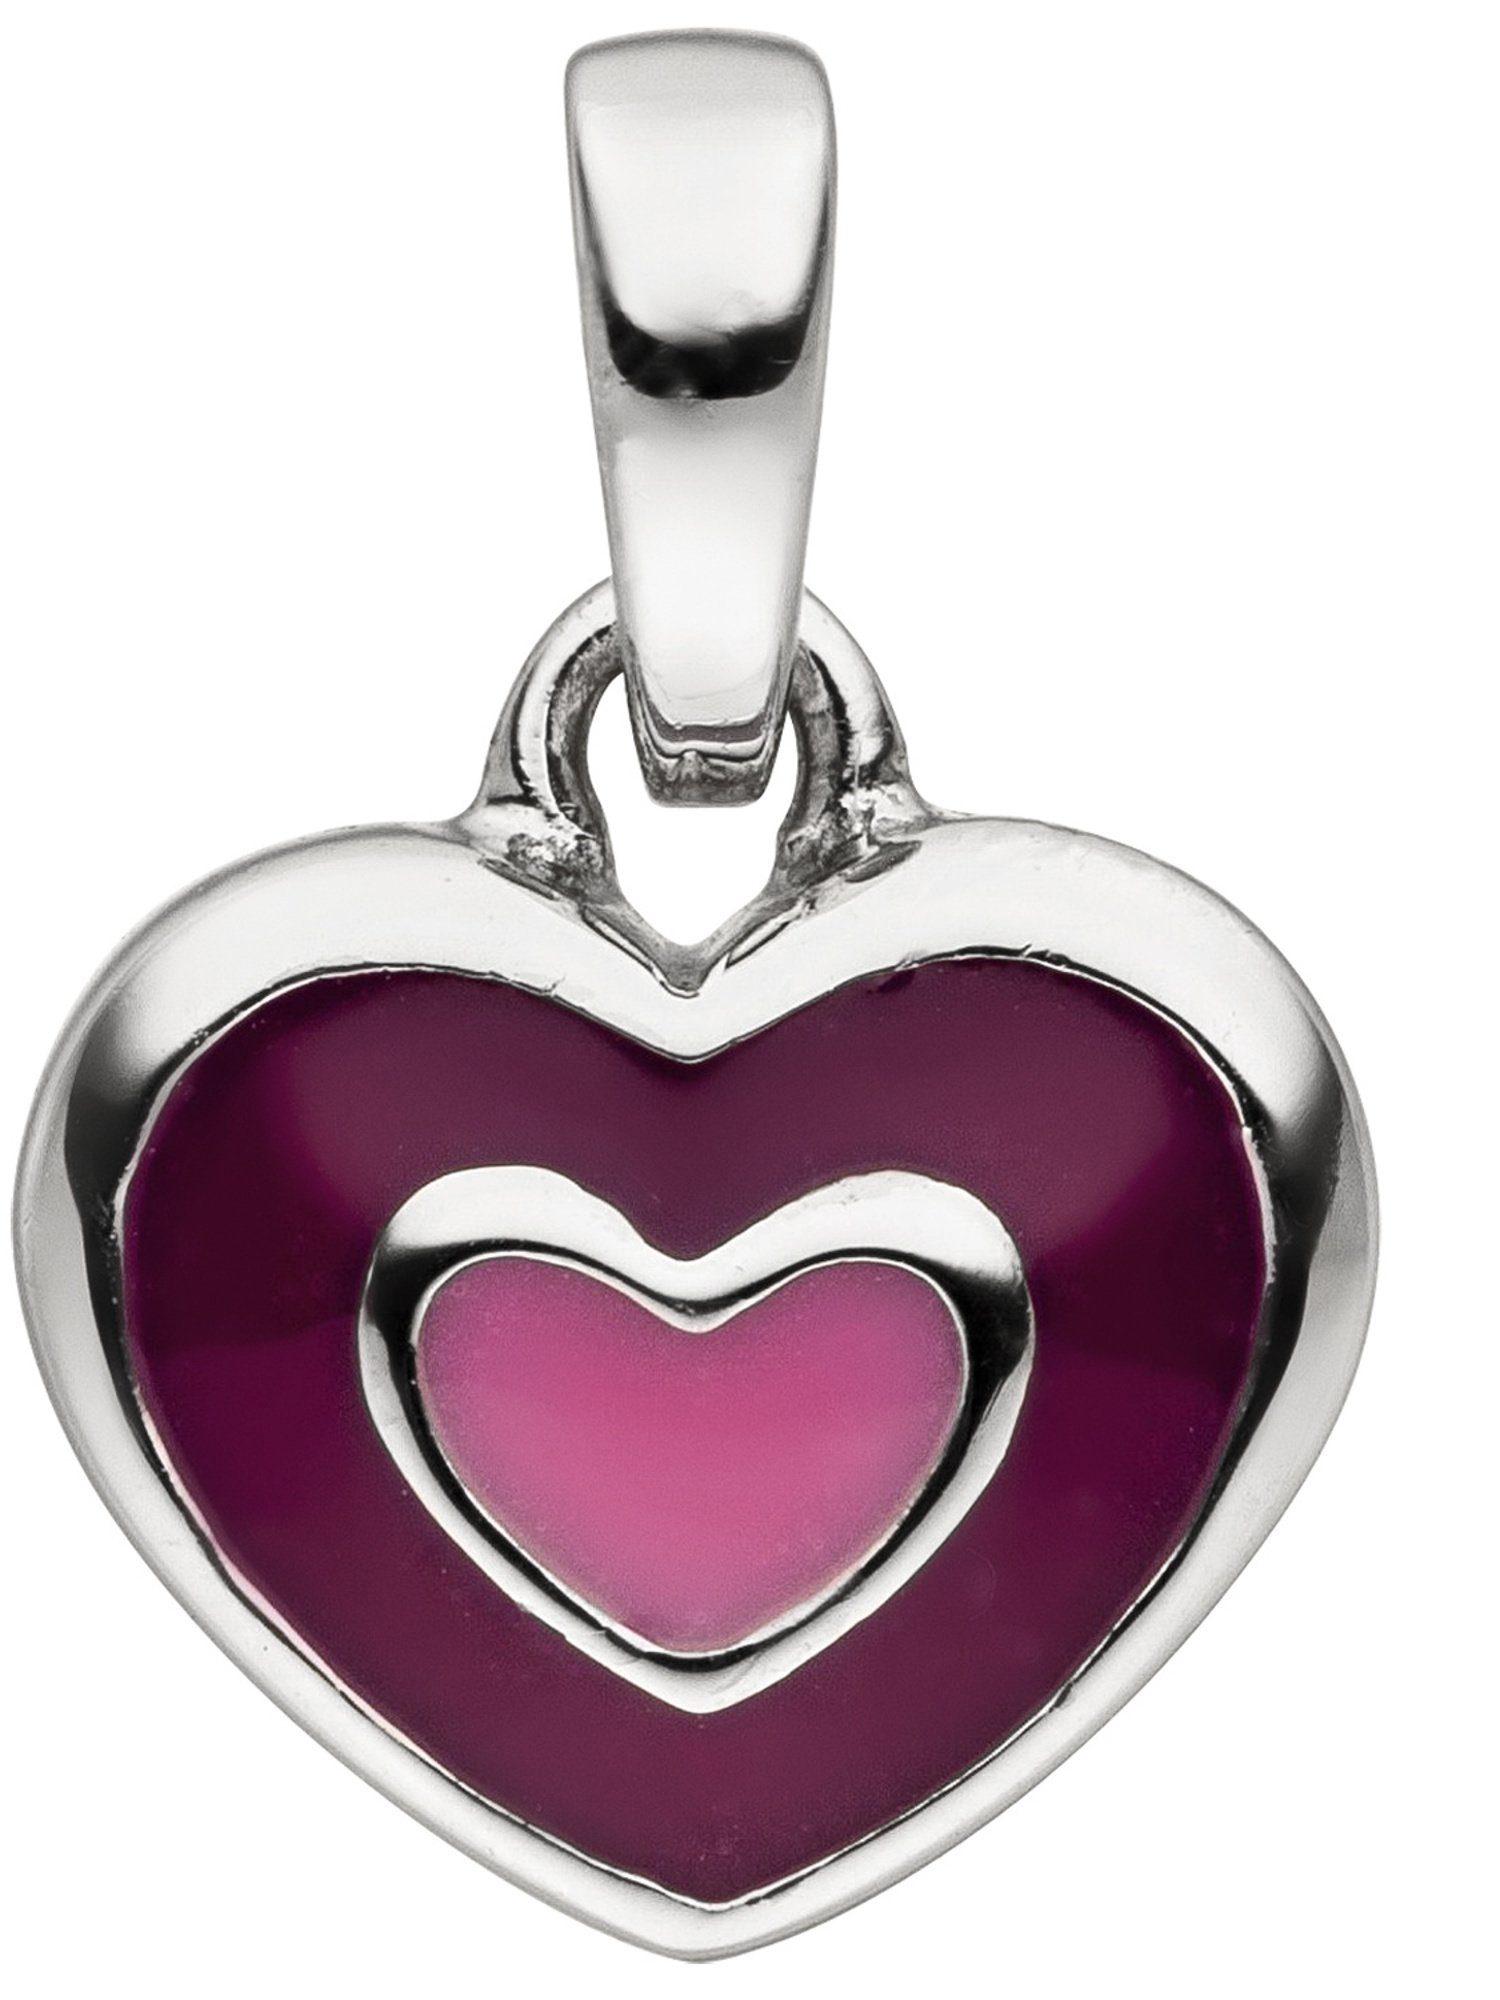 Adelia´s Kettenanhänger »Herz« 925 Silber